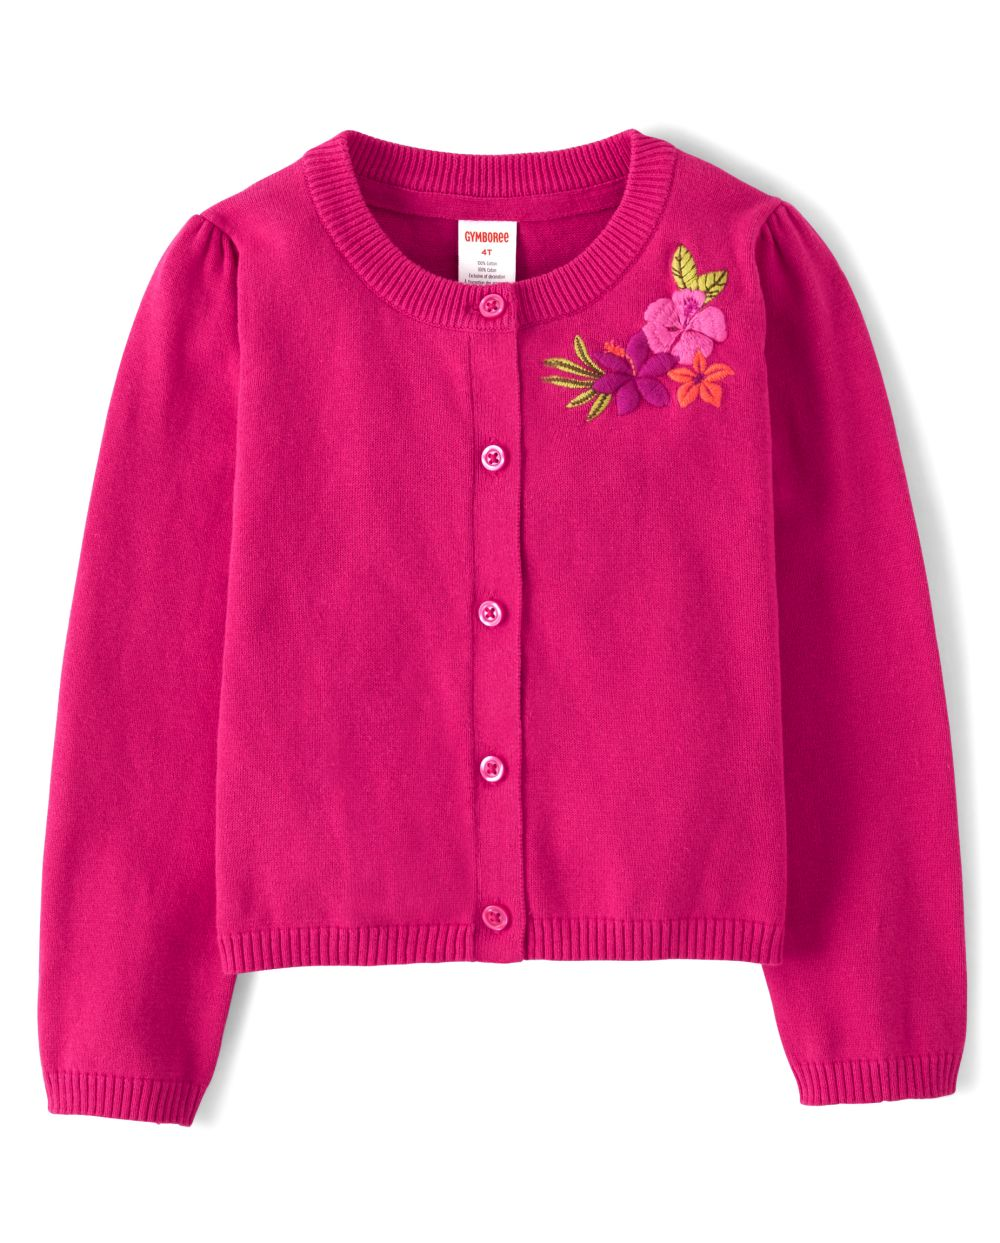 Girls Embroidered Flower Cardigan - Summer Safari